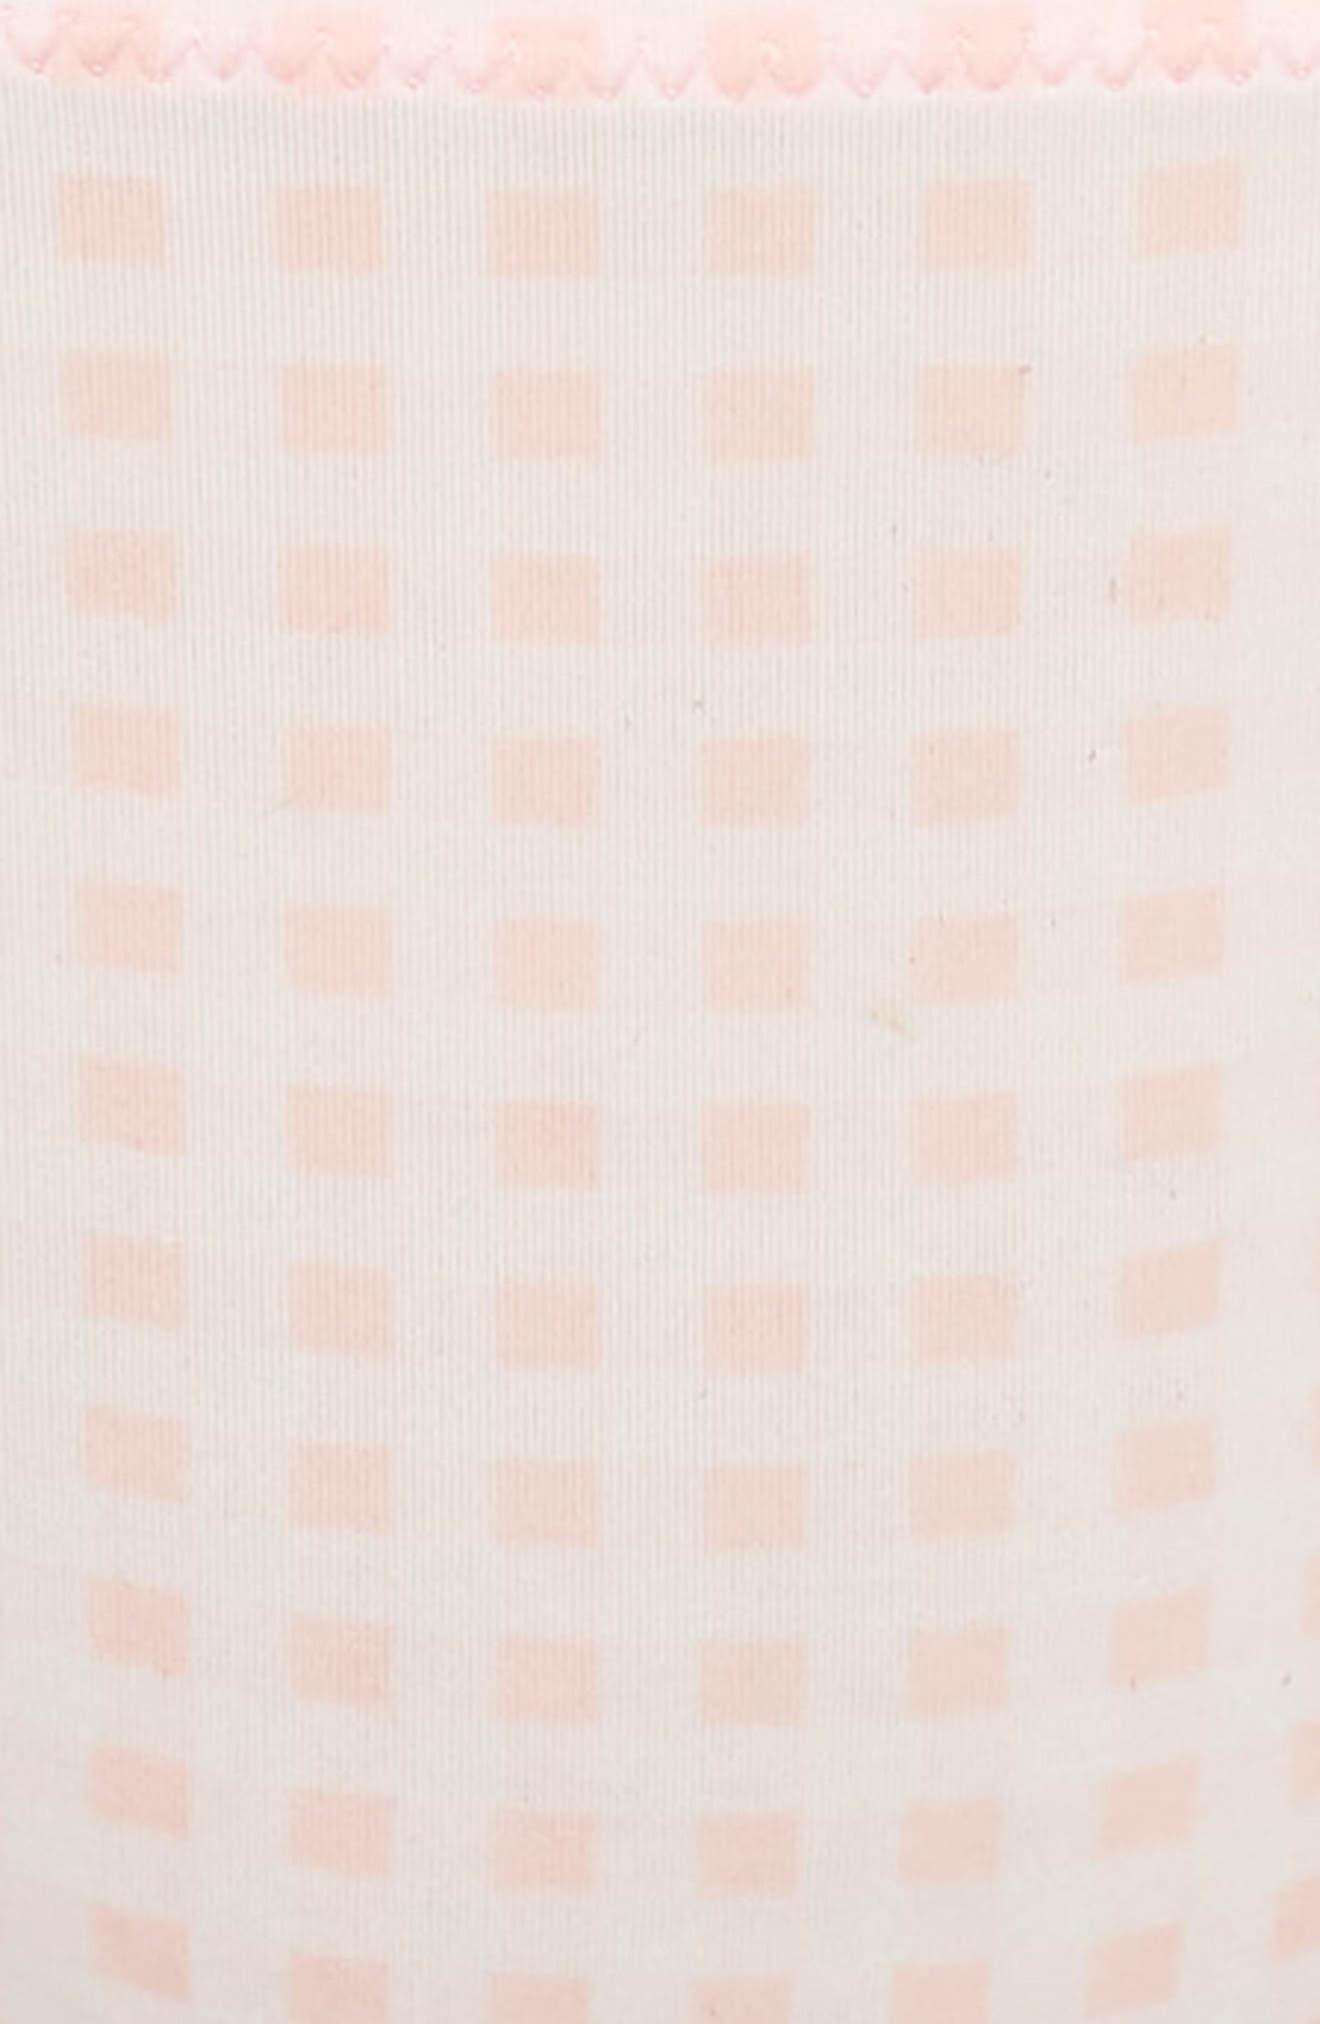 Gingham Thong,                             Alternate thumbnail 5, color,                             WARM PINK WHITE